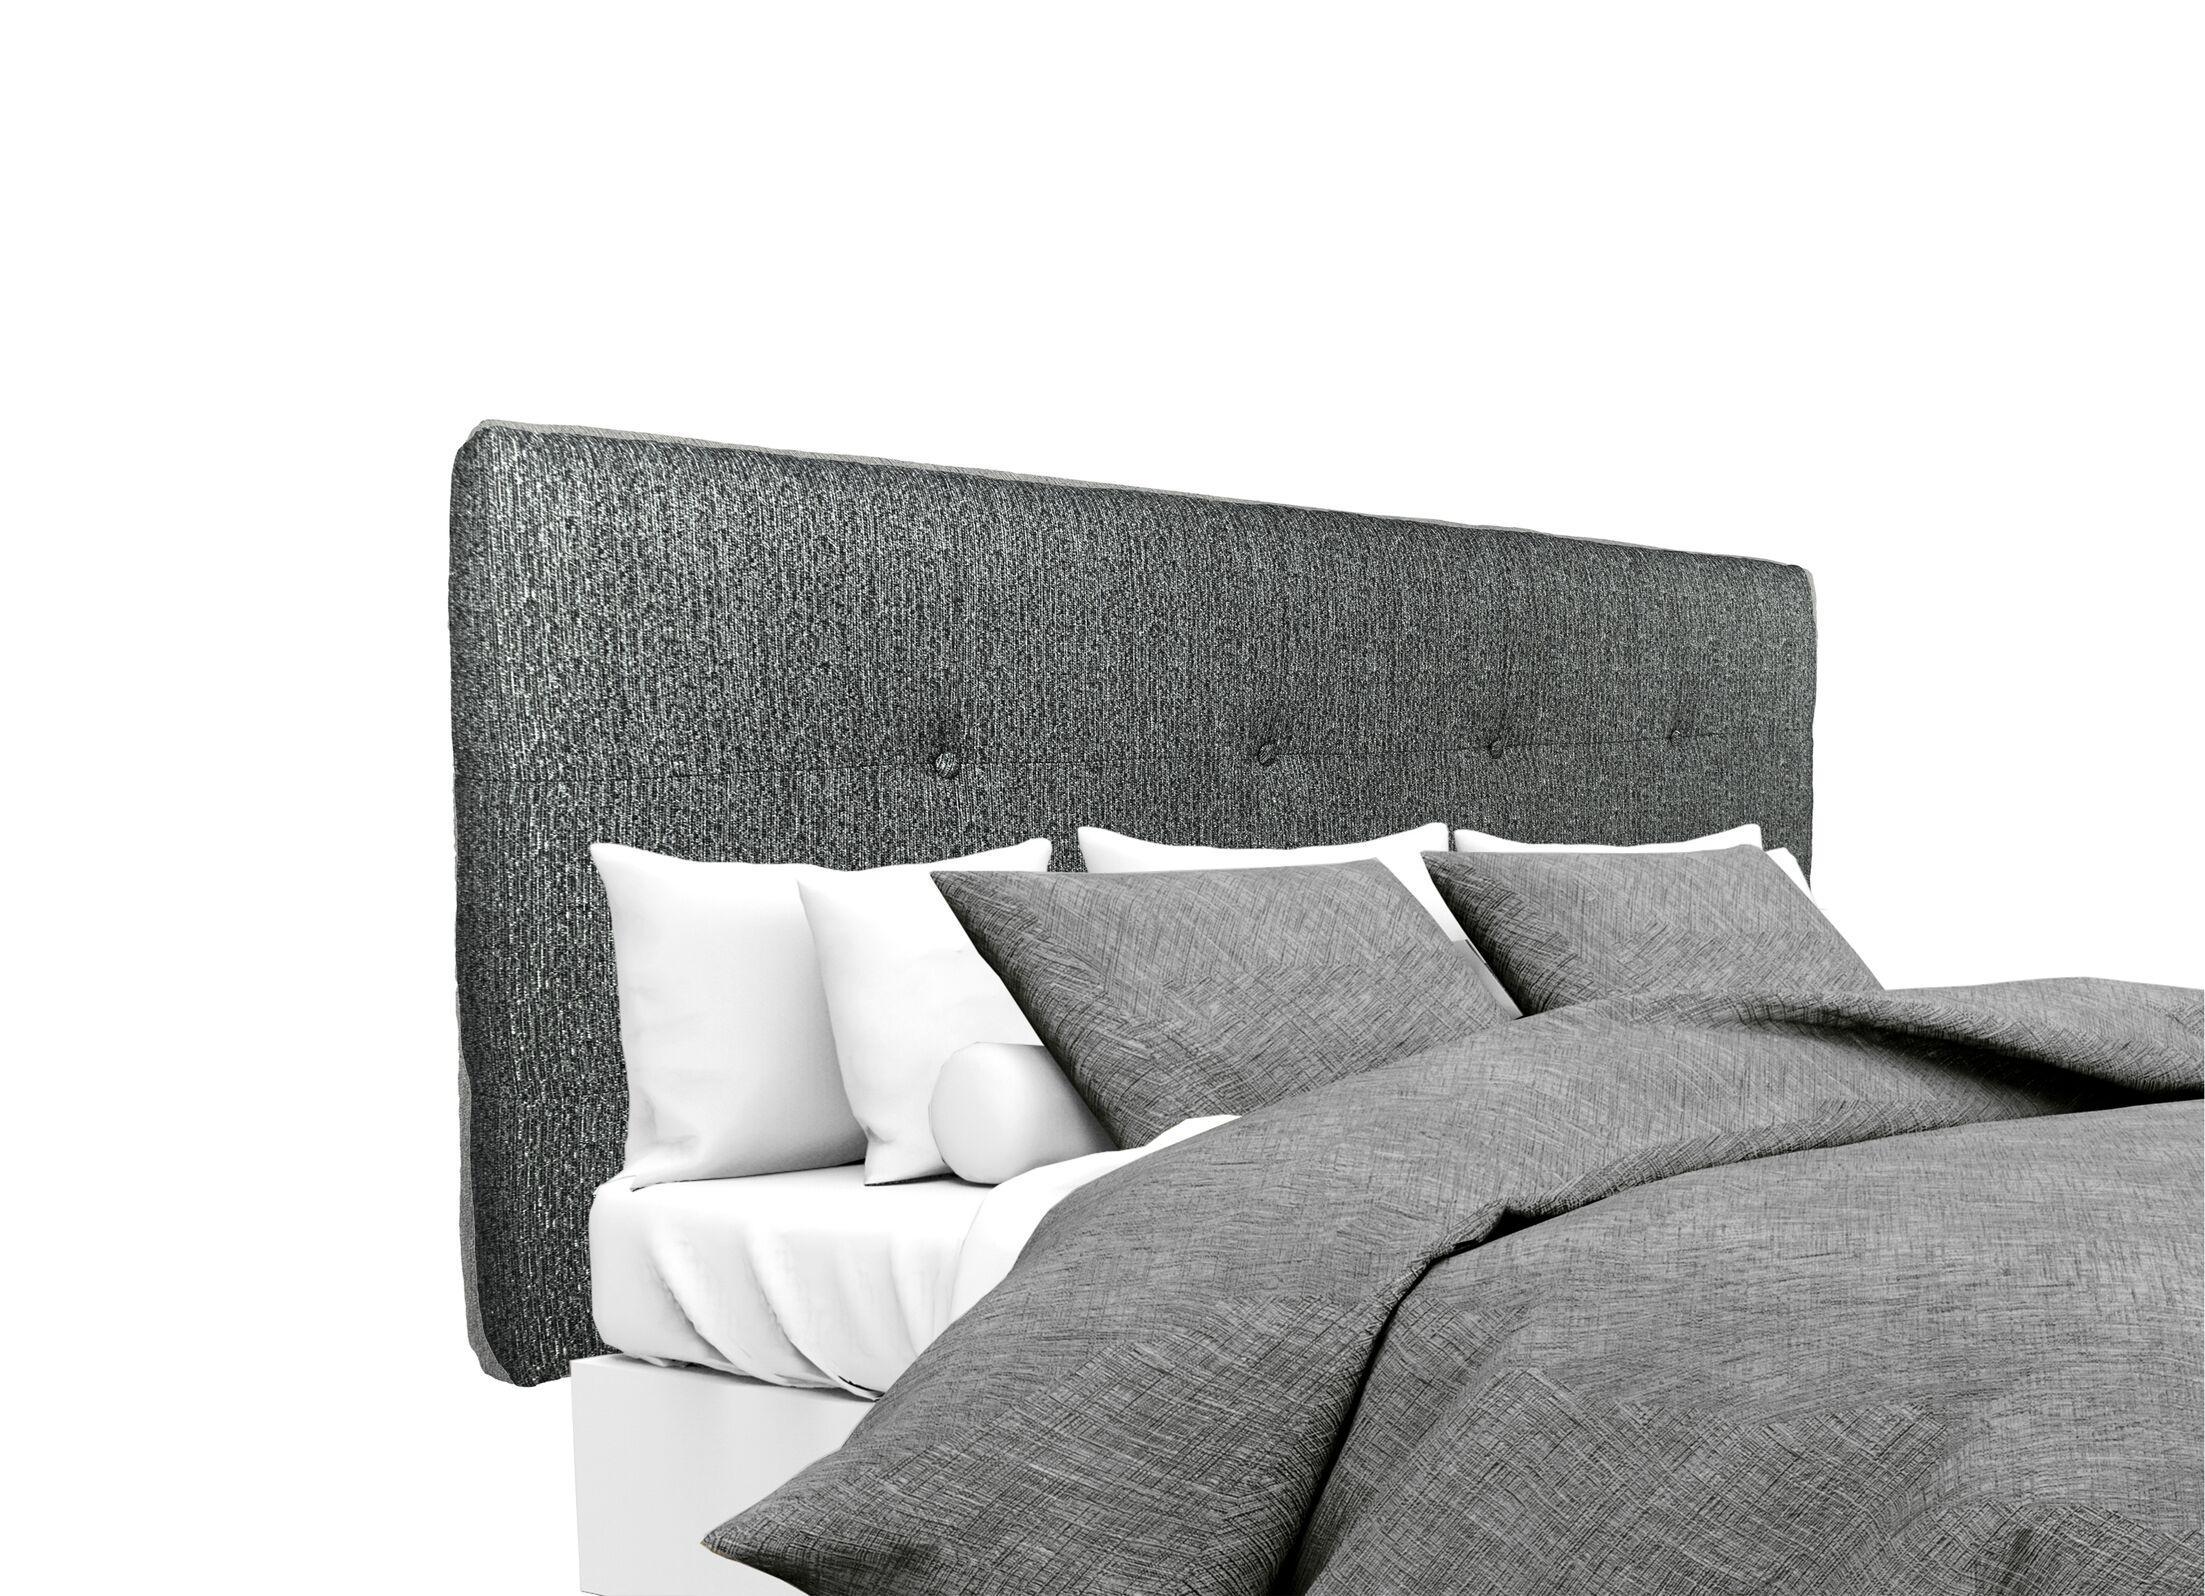 Olivia Upholstered Panel Headboard Size: Twin, Upholstery: Charcoal